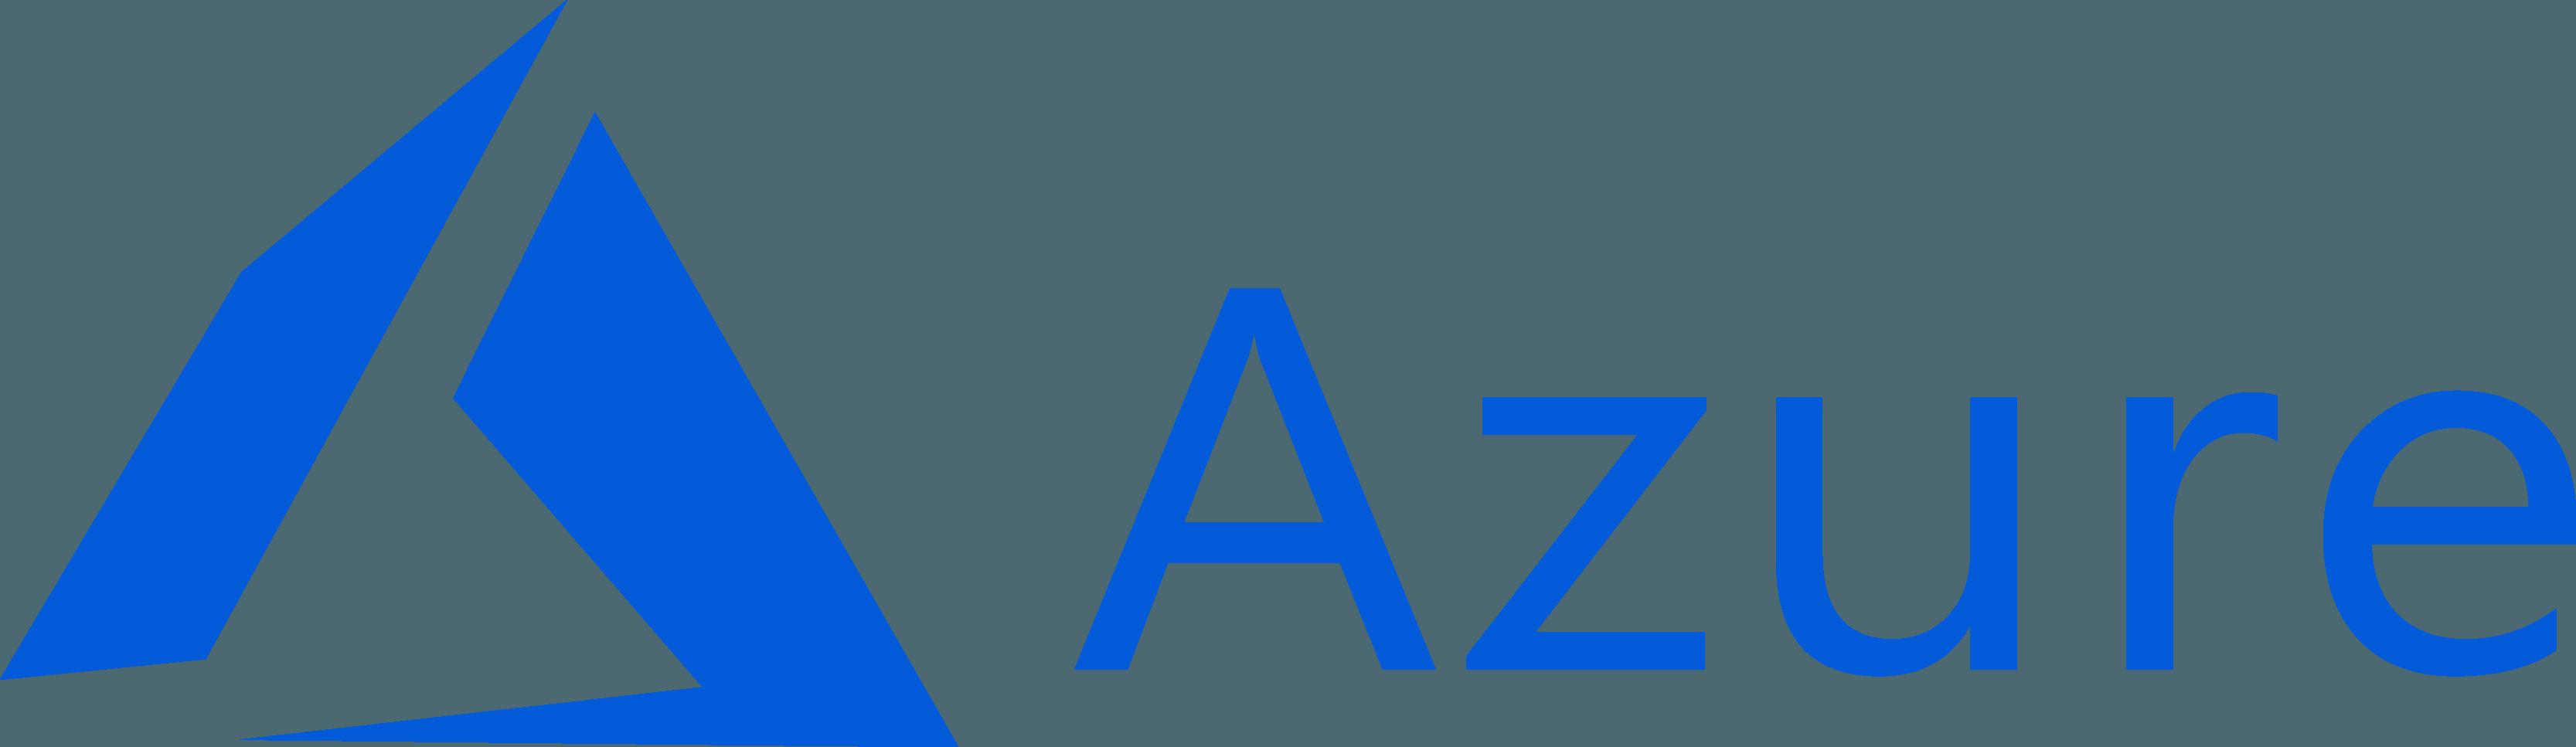 Microsoft Azure Logo [Windows] png